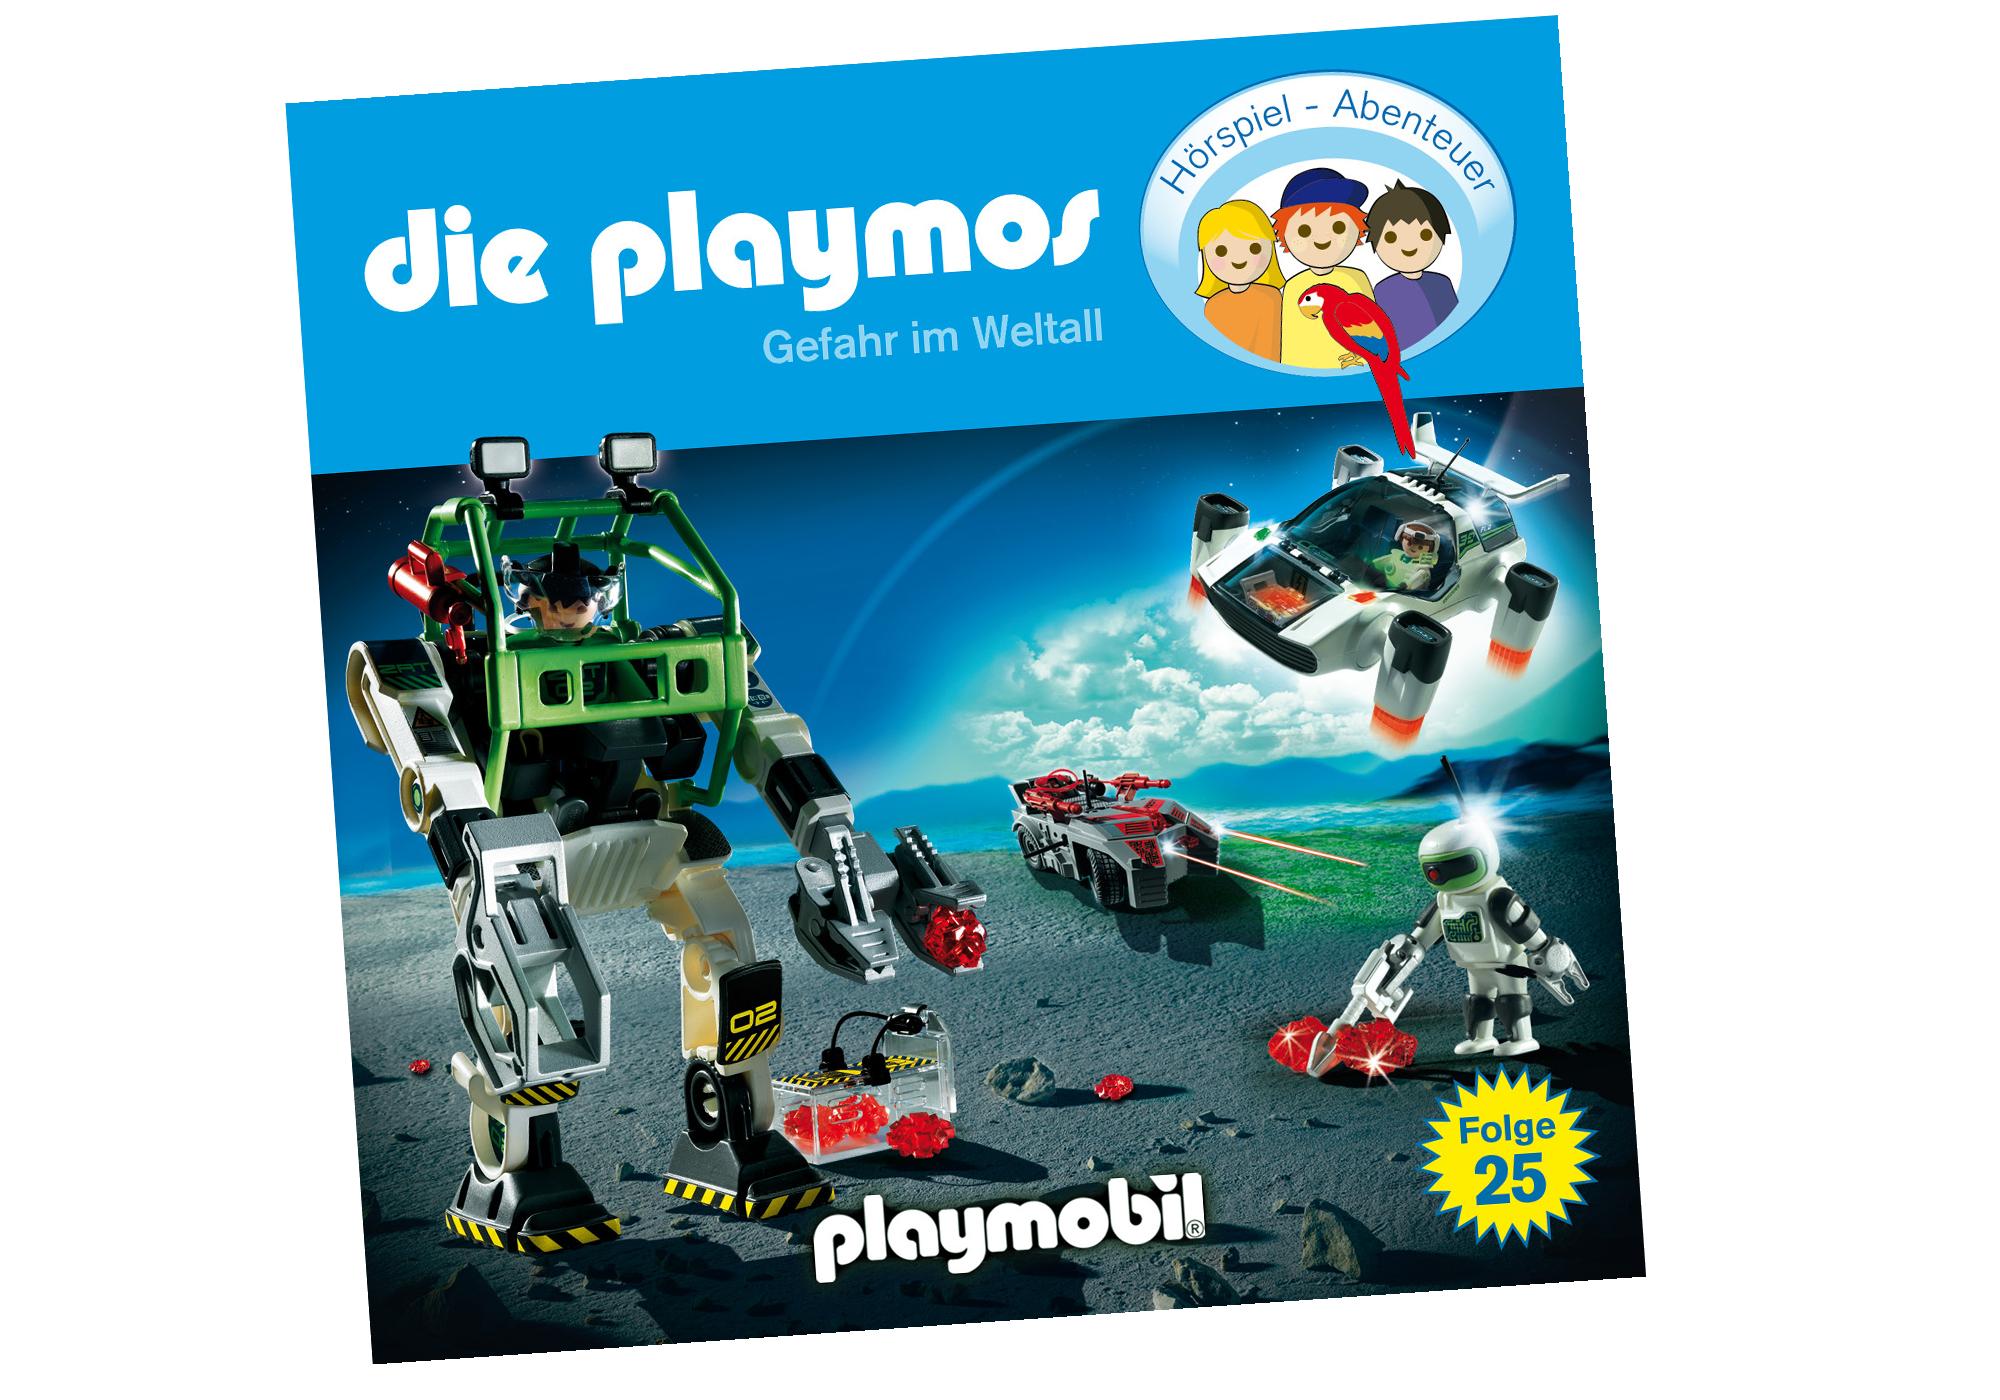 http://media.playmobil.com/i/playmobil/80331_product_detail